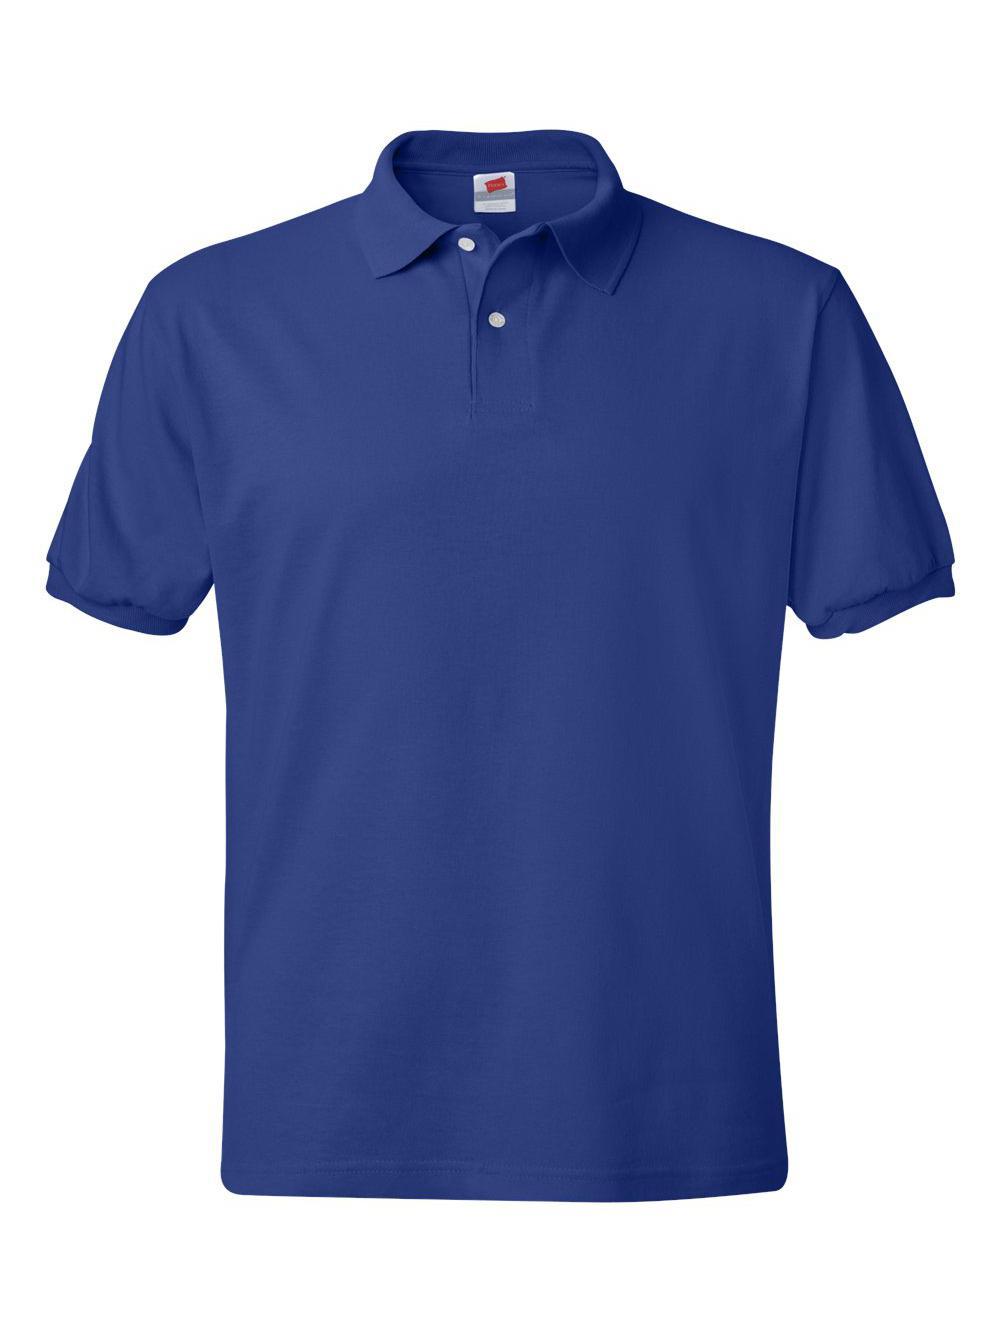 Hanes-Ecosmart-Jersey-Sport-Shirt-054X thumbnail 18